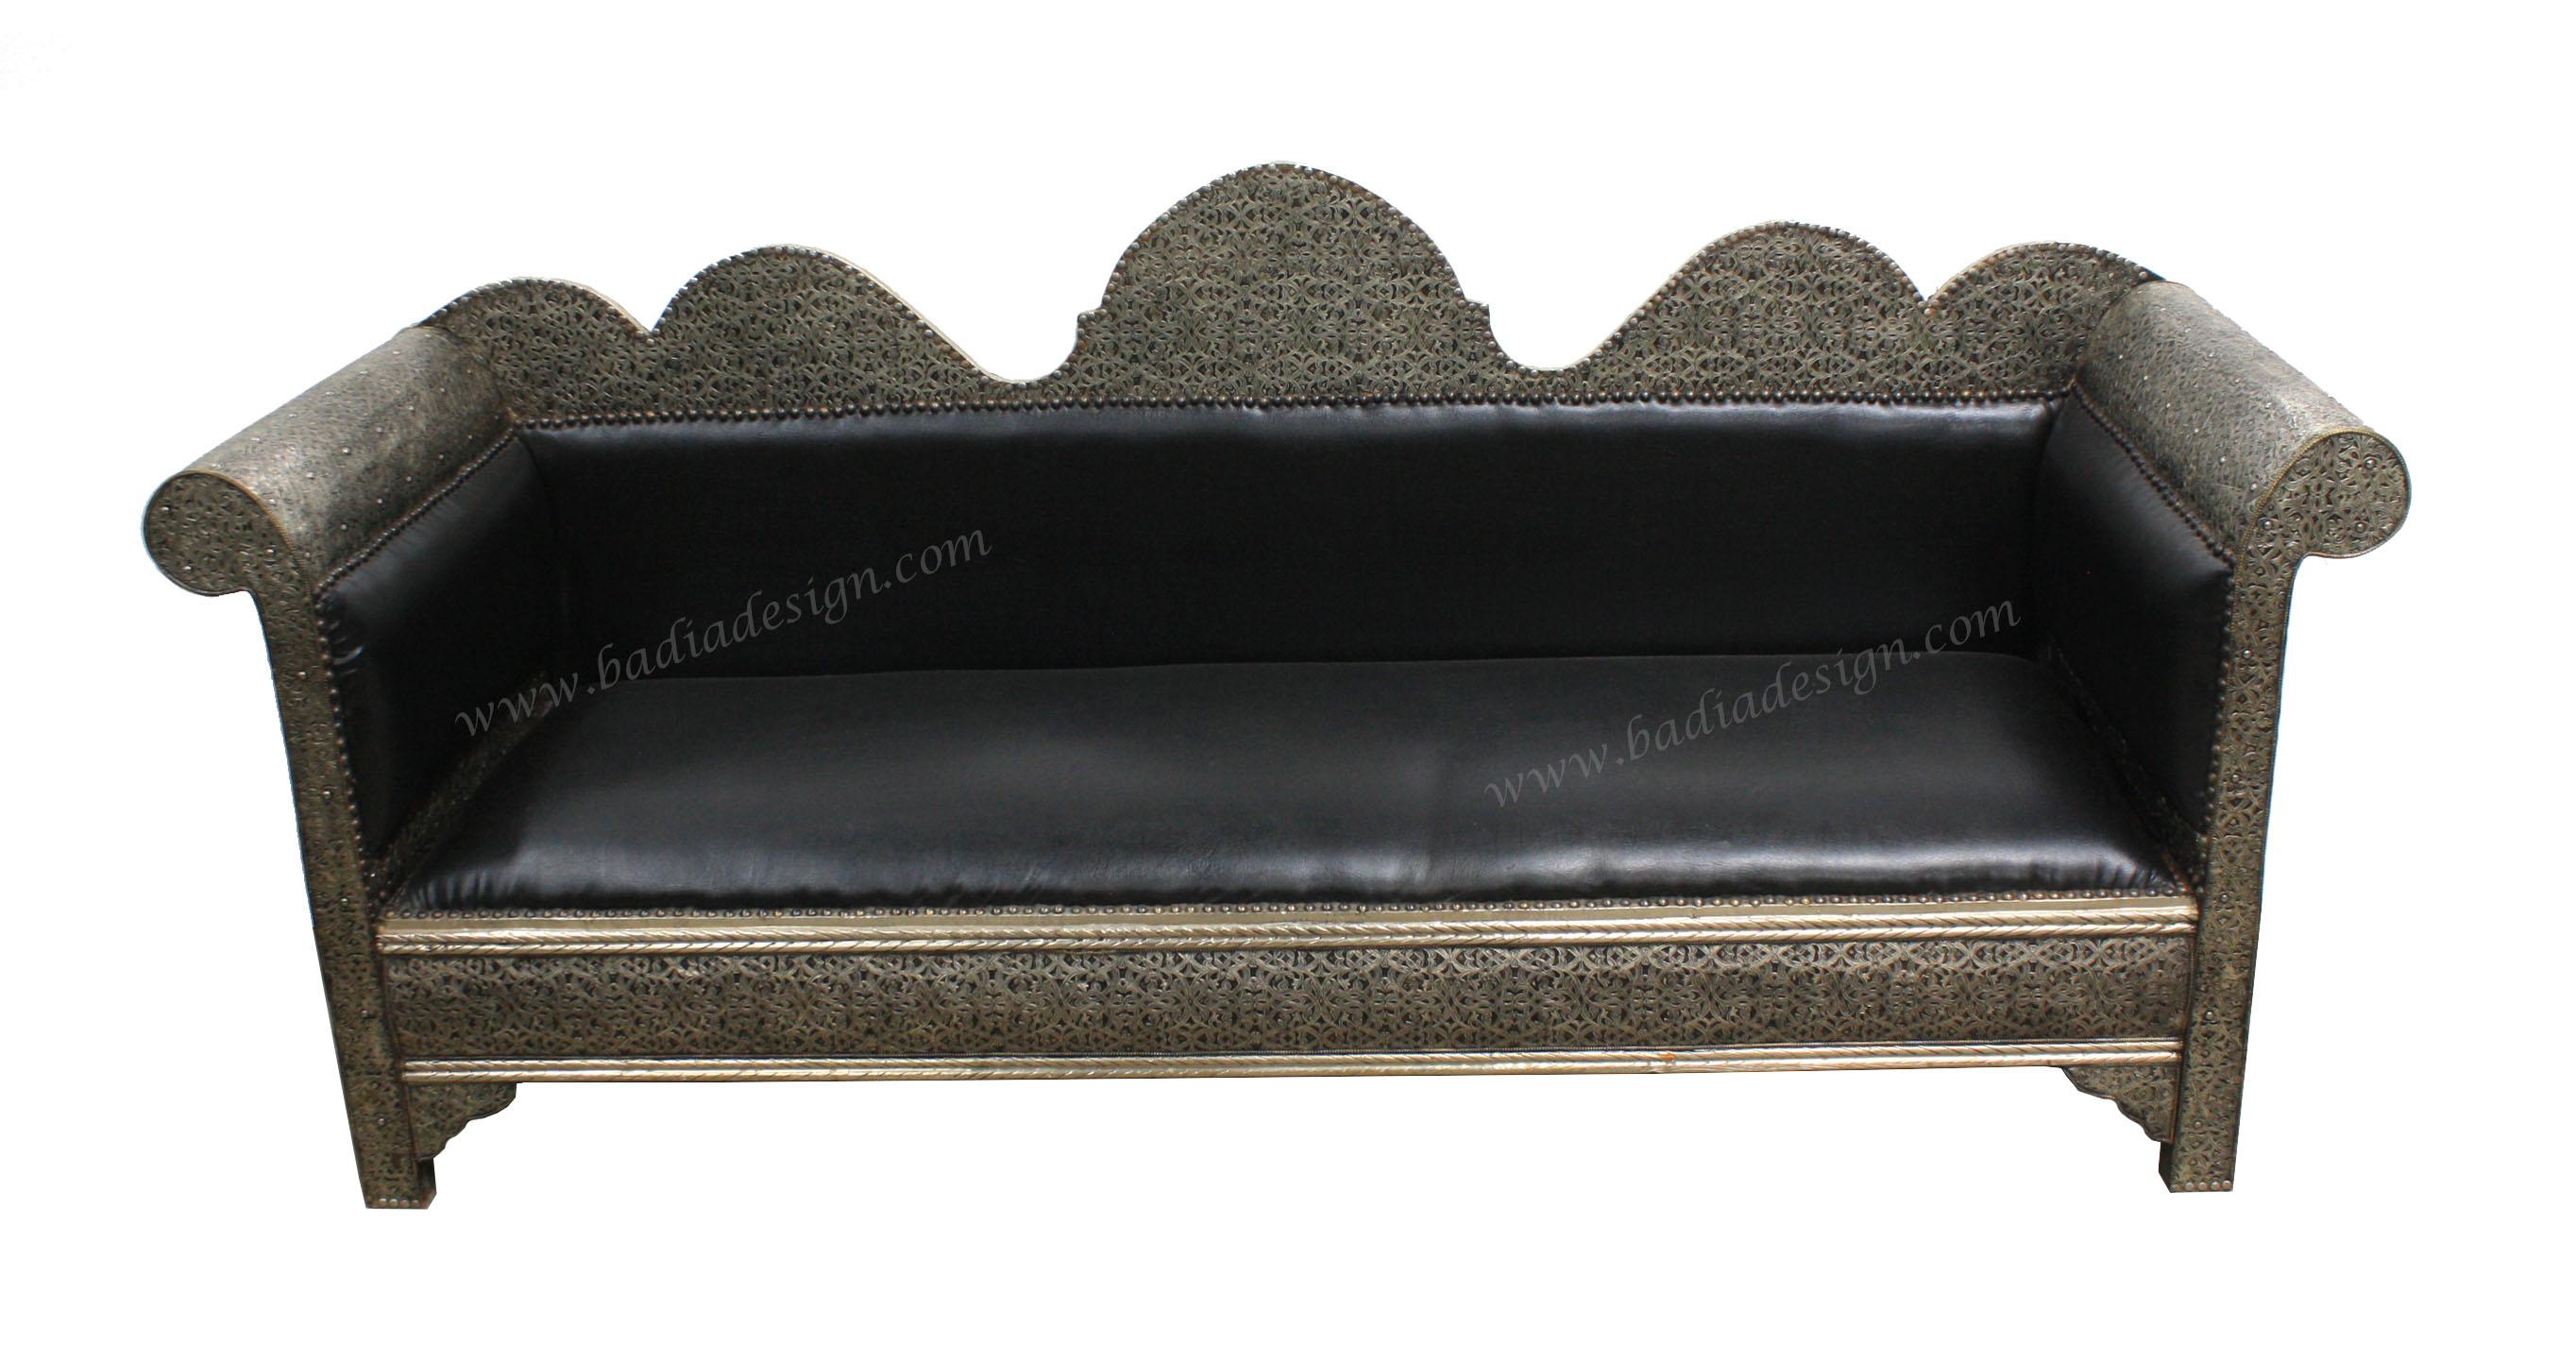 high-end-furniture-los-angeles-nk-b001-1a.jpg